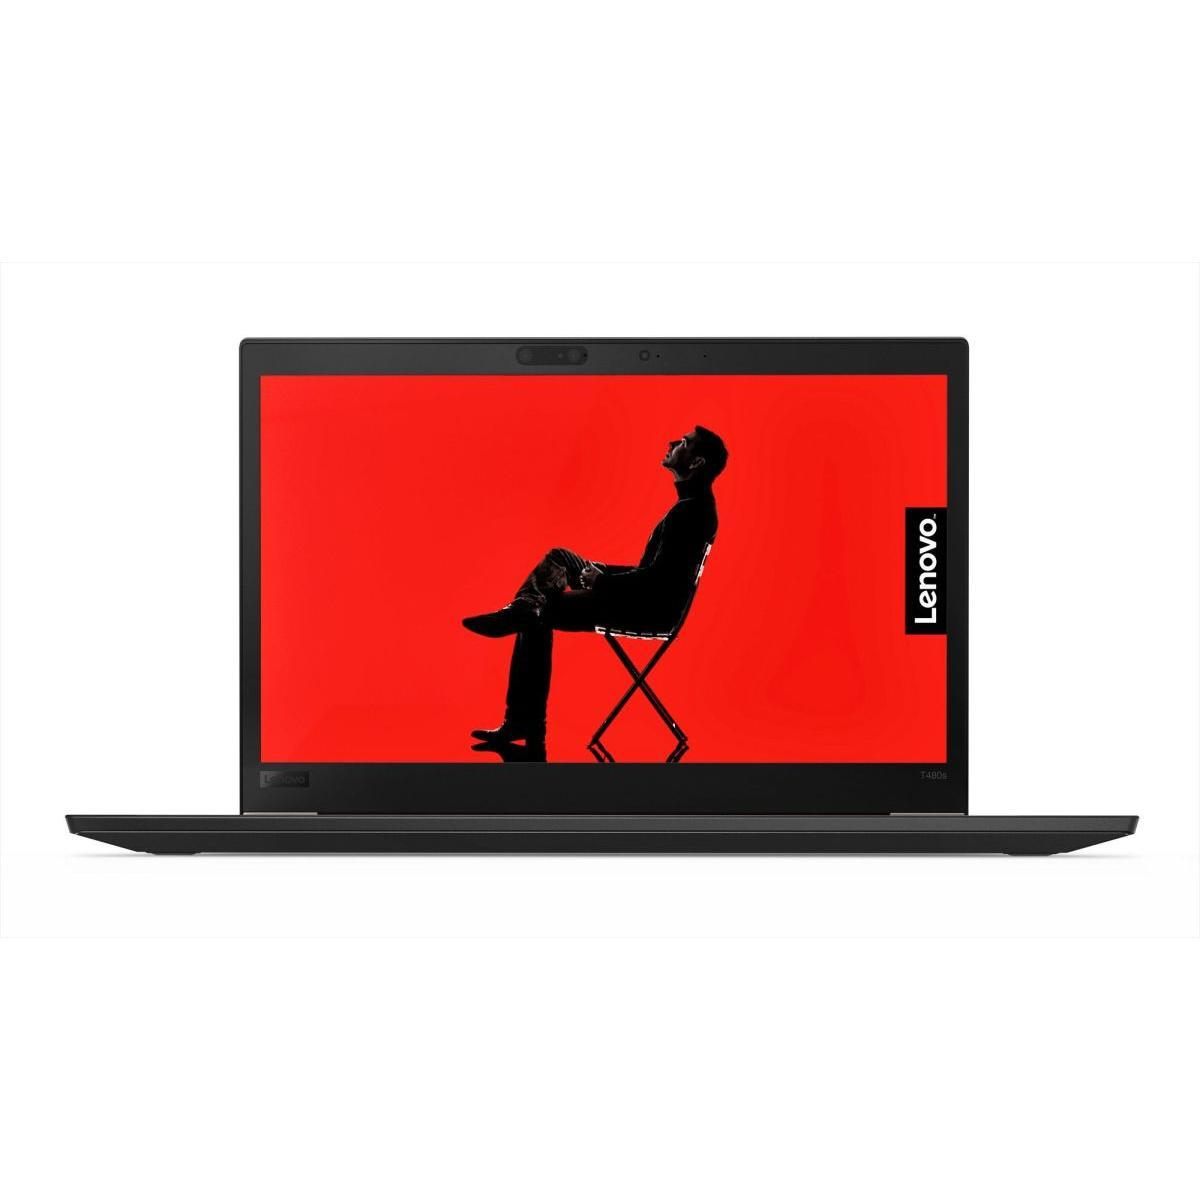 Lenovo ThinkPad T480S 14-inch (2018) - Core i7-8650U - 16GB - SSD 512 GB QWERTY - Spanish